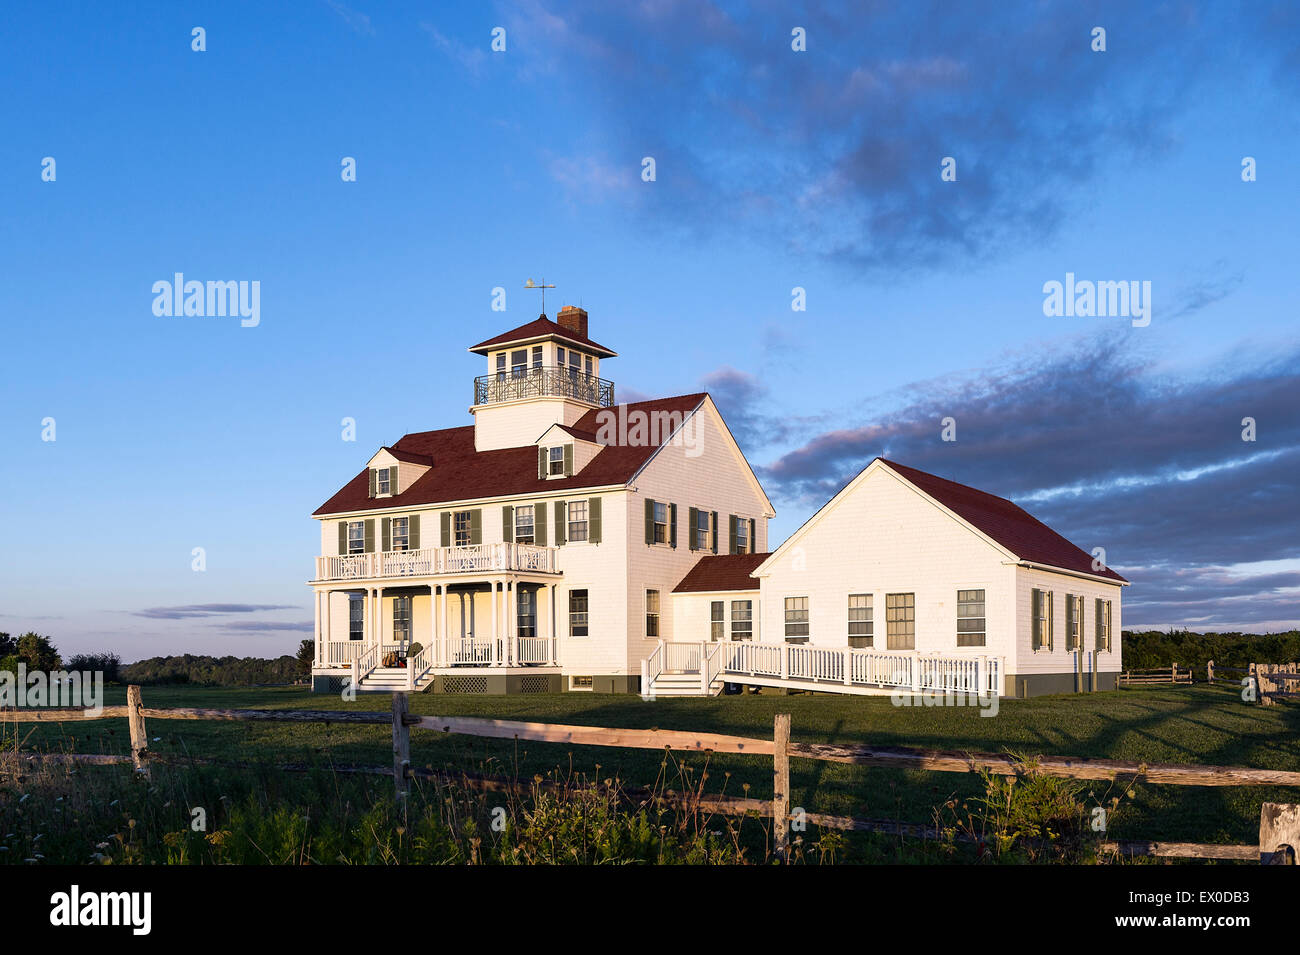 Coast Guard Station, Eastham, Cape Cod, Massachusetts, USA - Stock Image